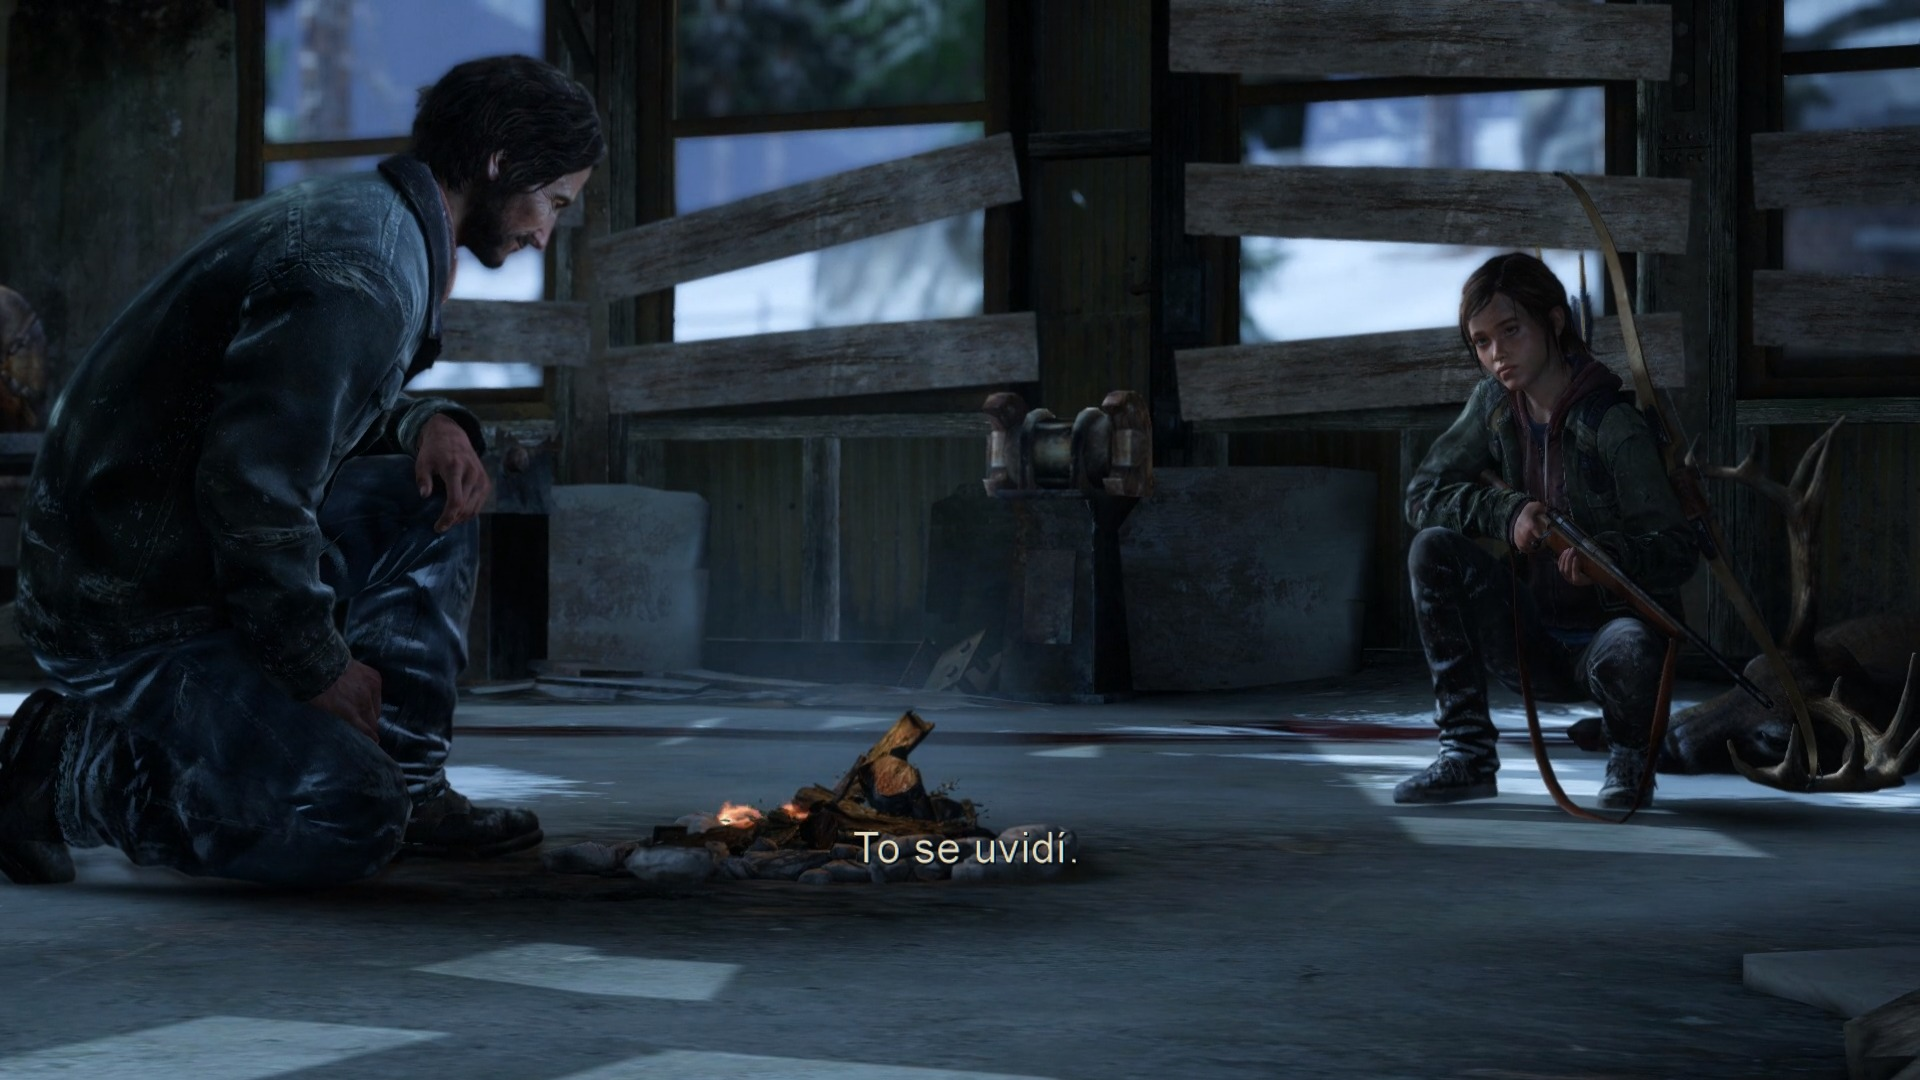 Zaostřeno na: The Last of Us Remastered 9150